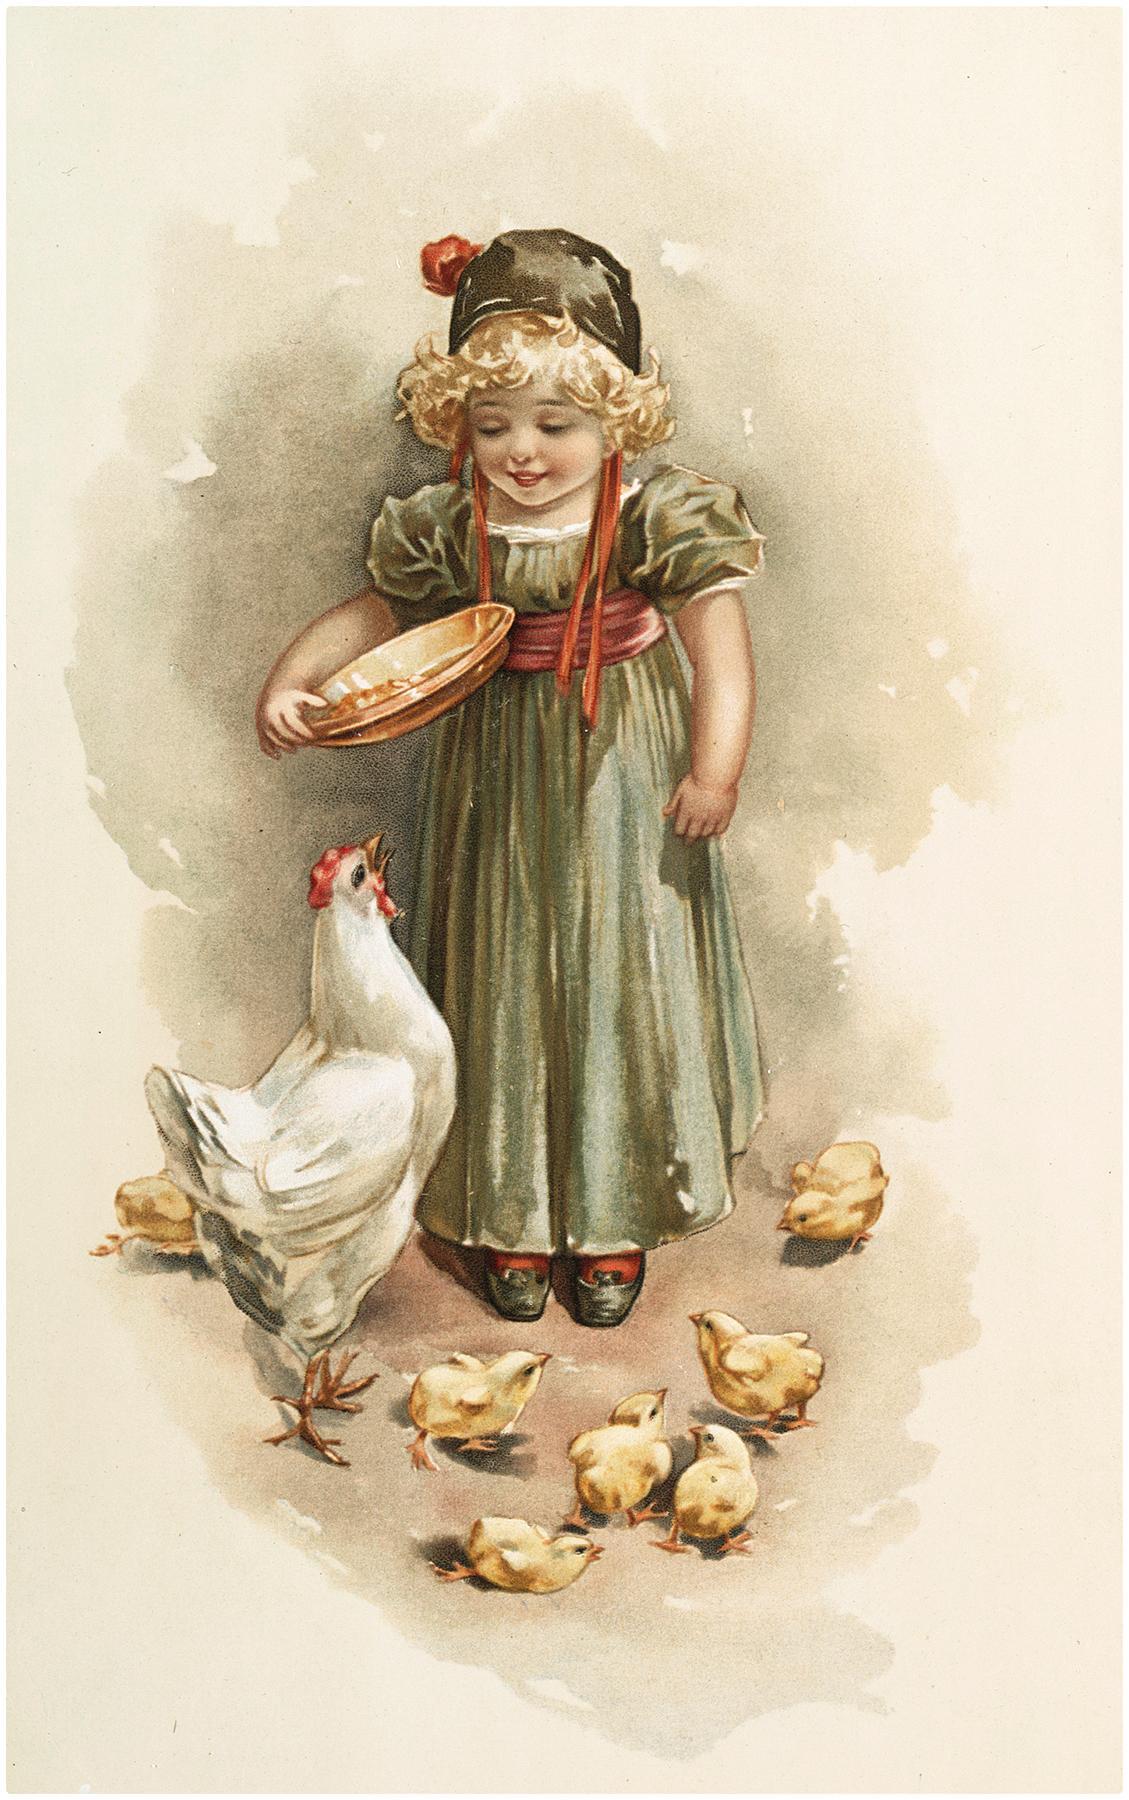 Vintage Farm Girl Image